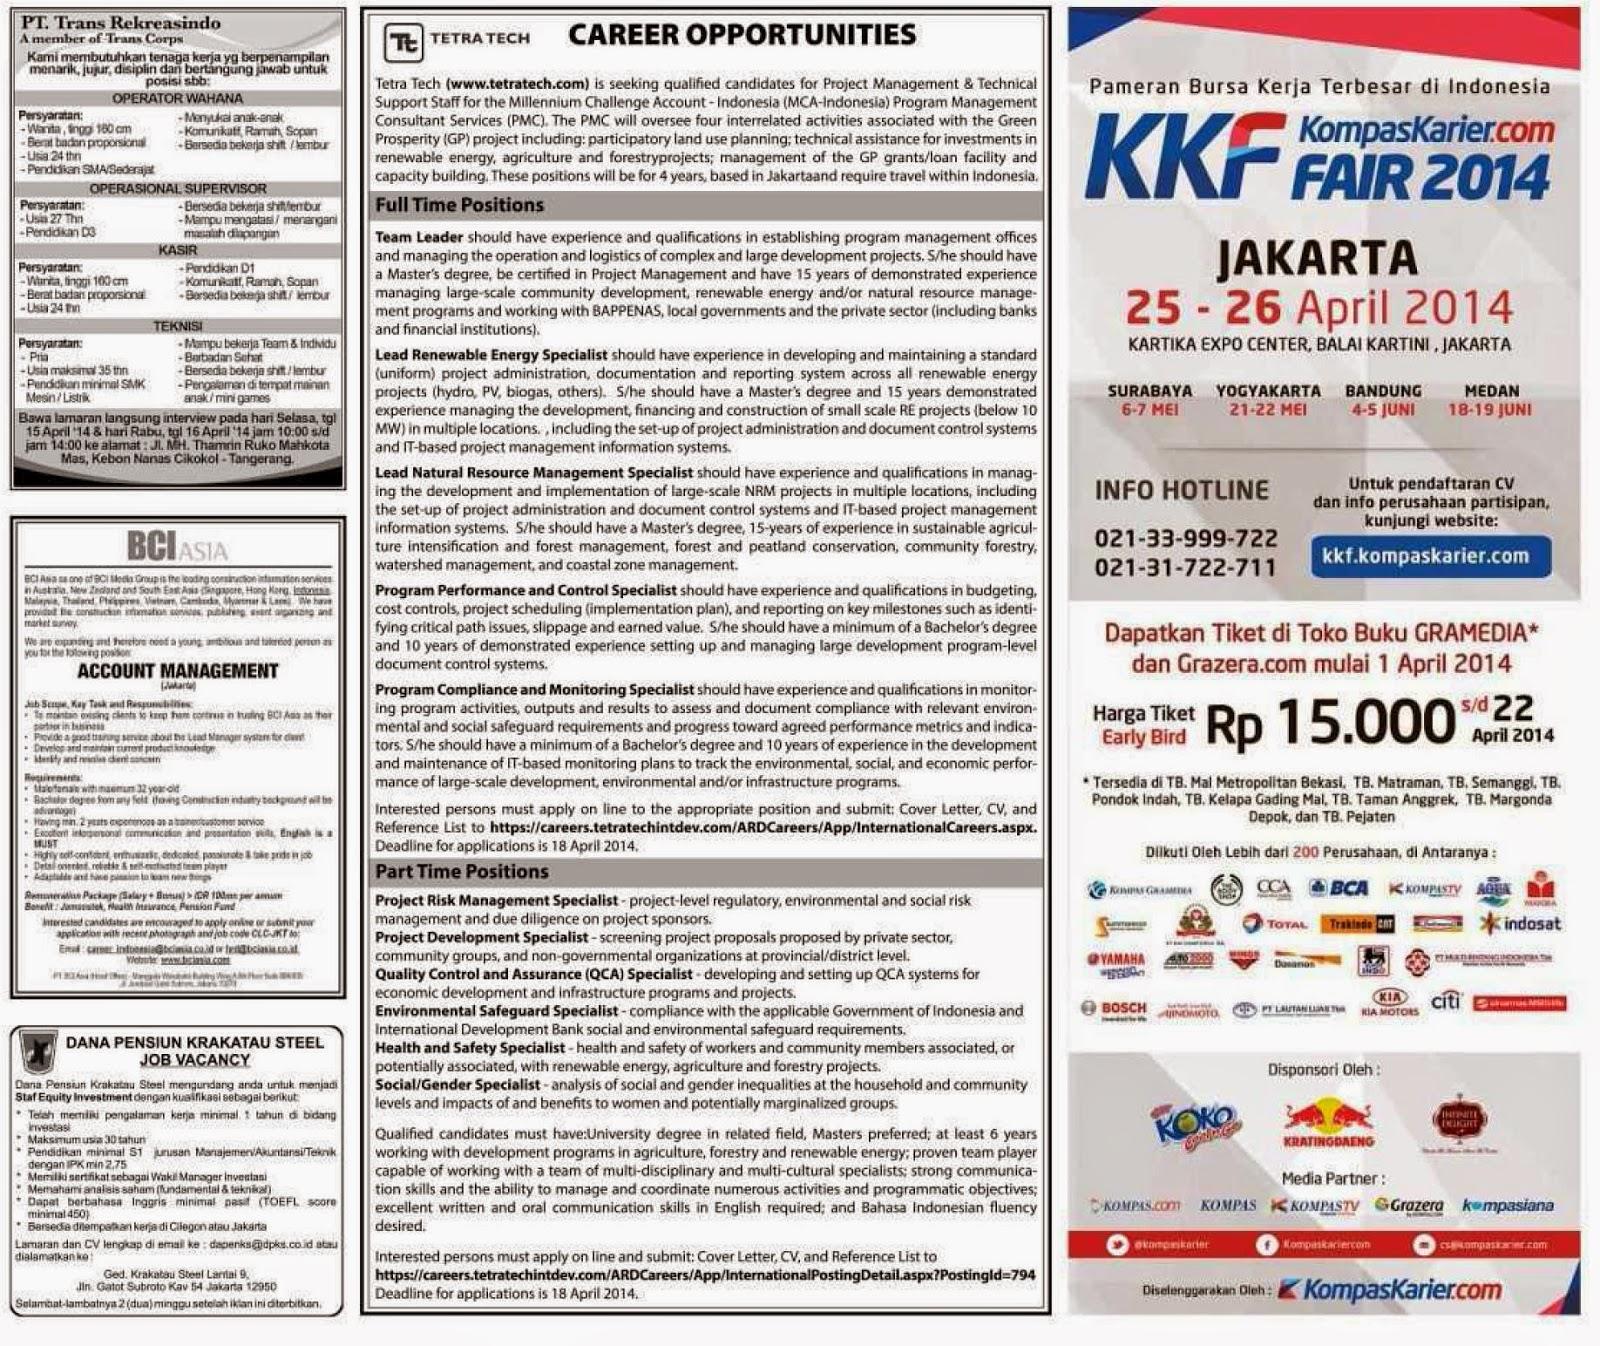 iklan Lowongan kerja koran kompas Sabtu 12 April 2014